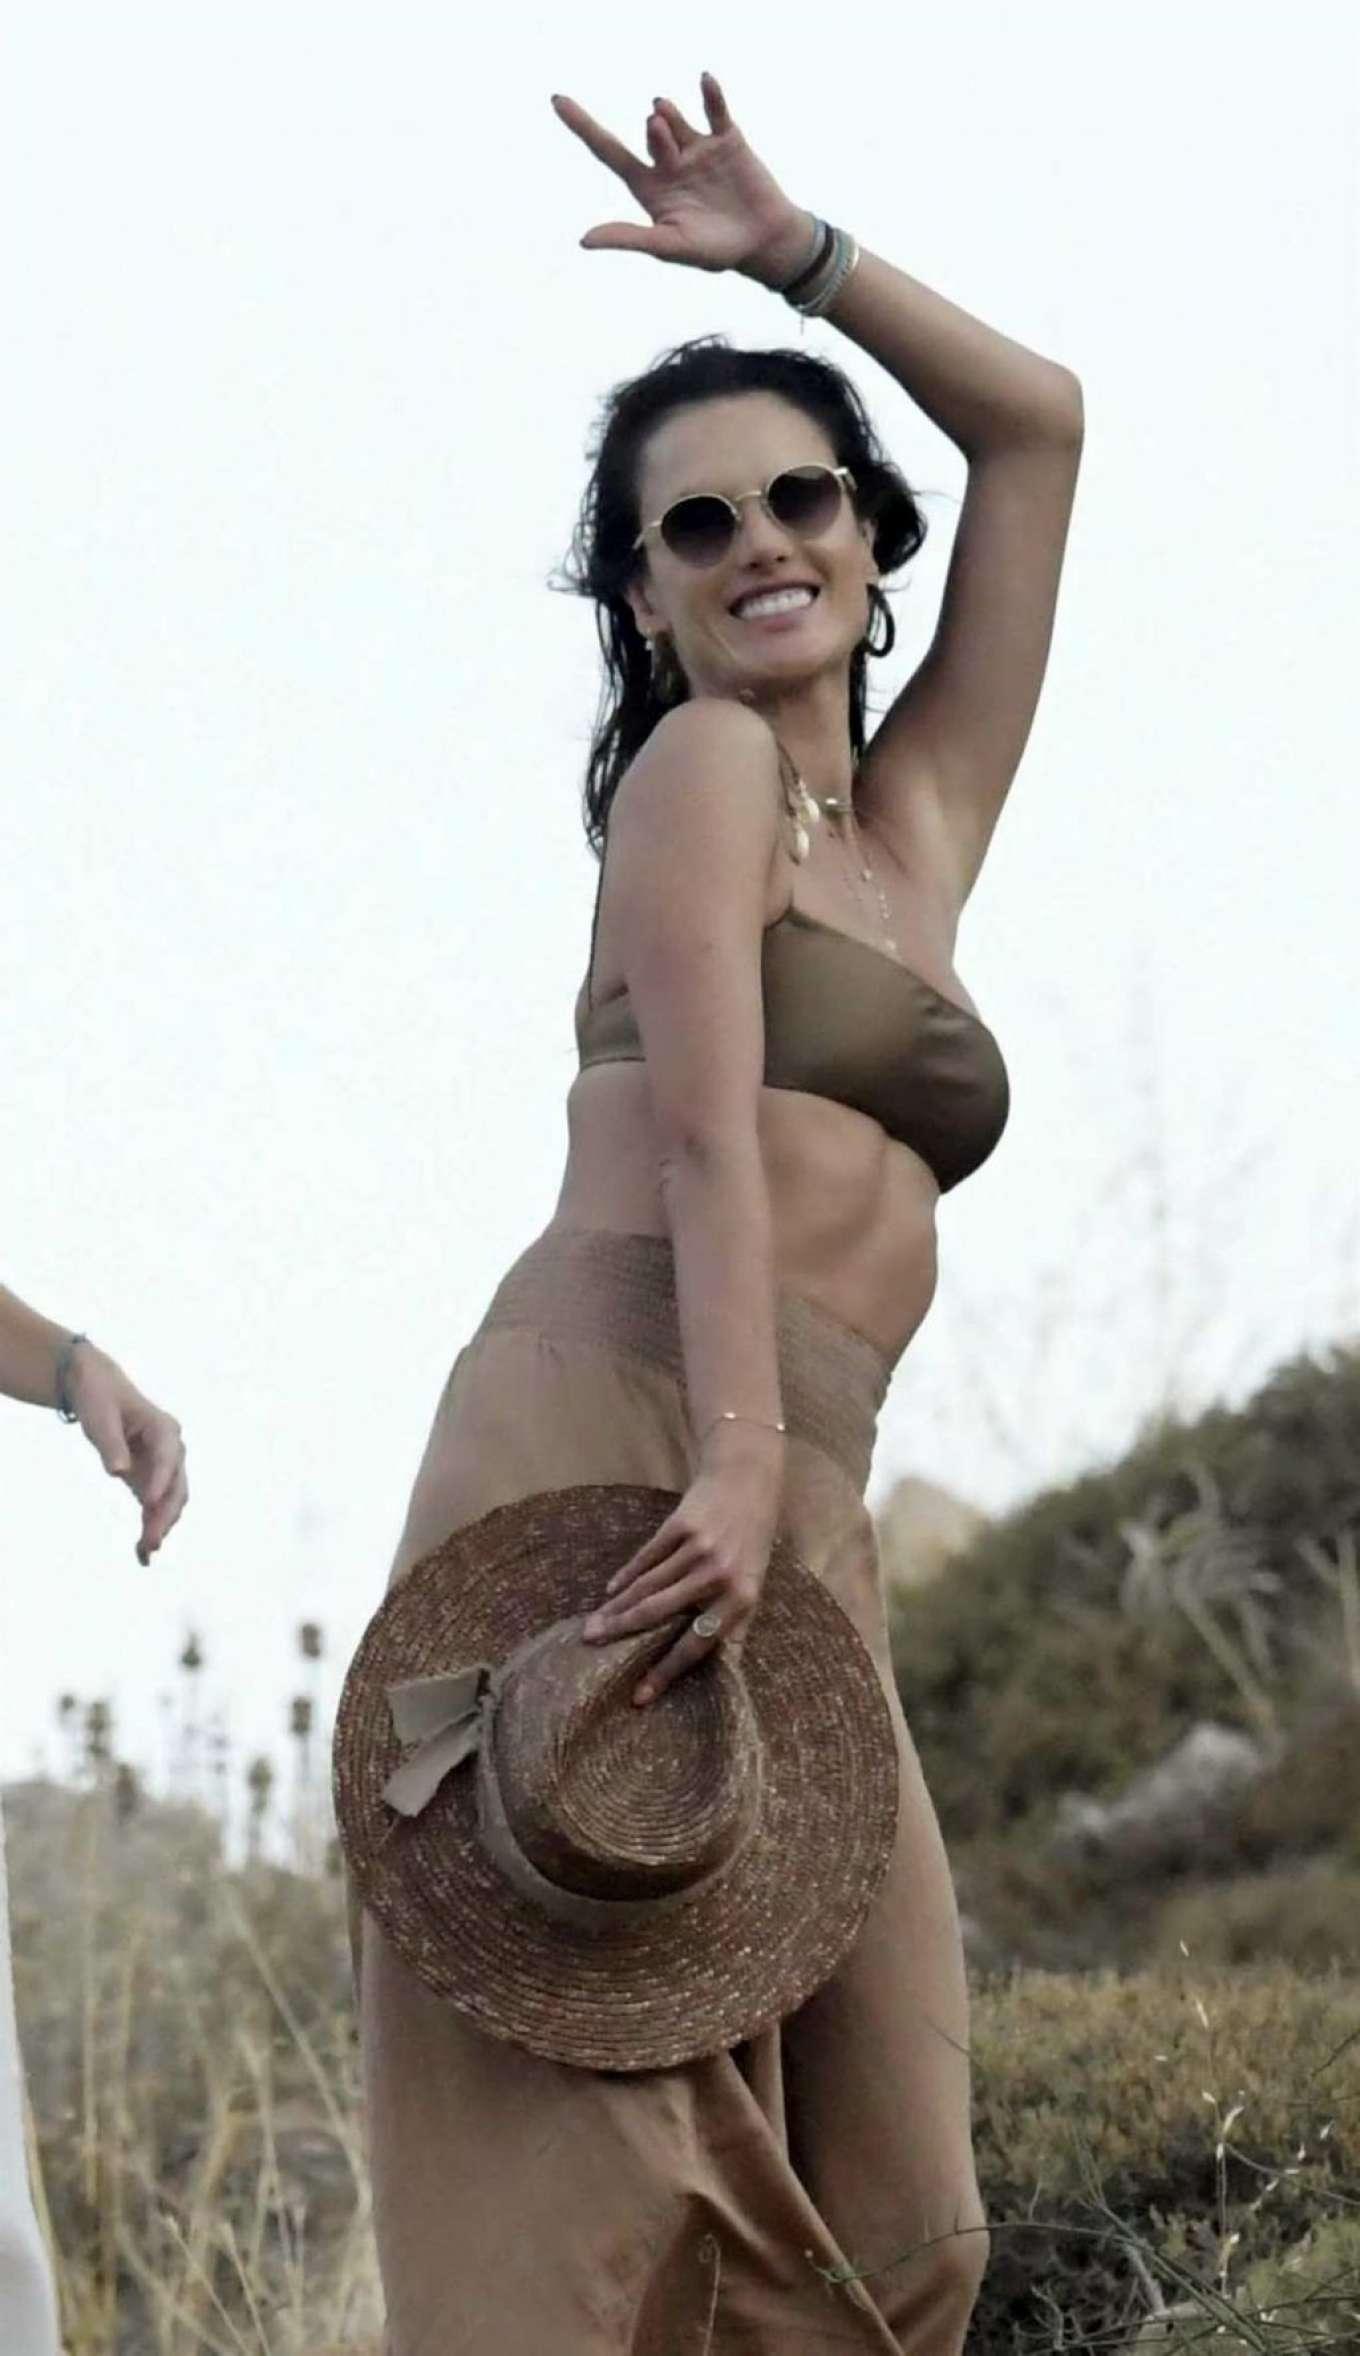 Alessandra Ambrosio in Bikini Top at Kensho Psarou Beach in Mykonos